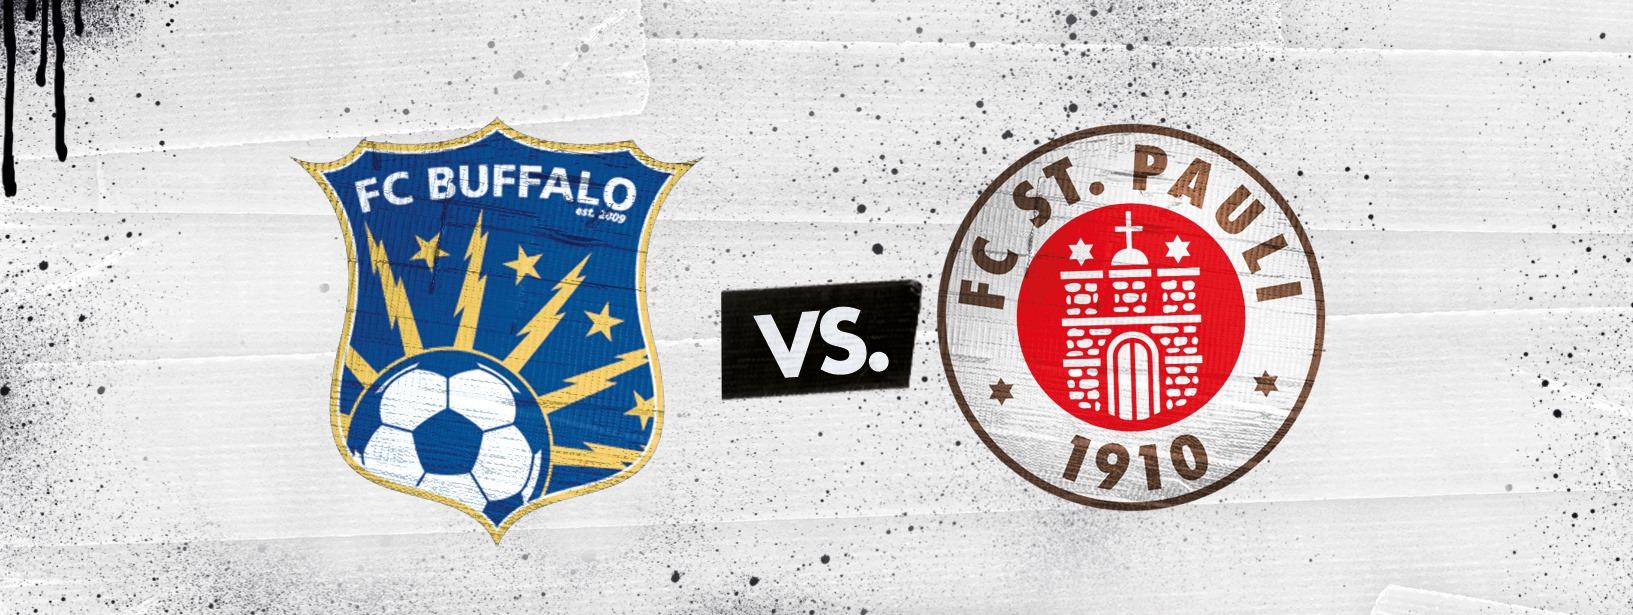 Ab 21 Uhr im Livestream: Unsere Kiezkicker gegen den FC Buffalo